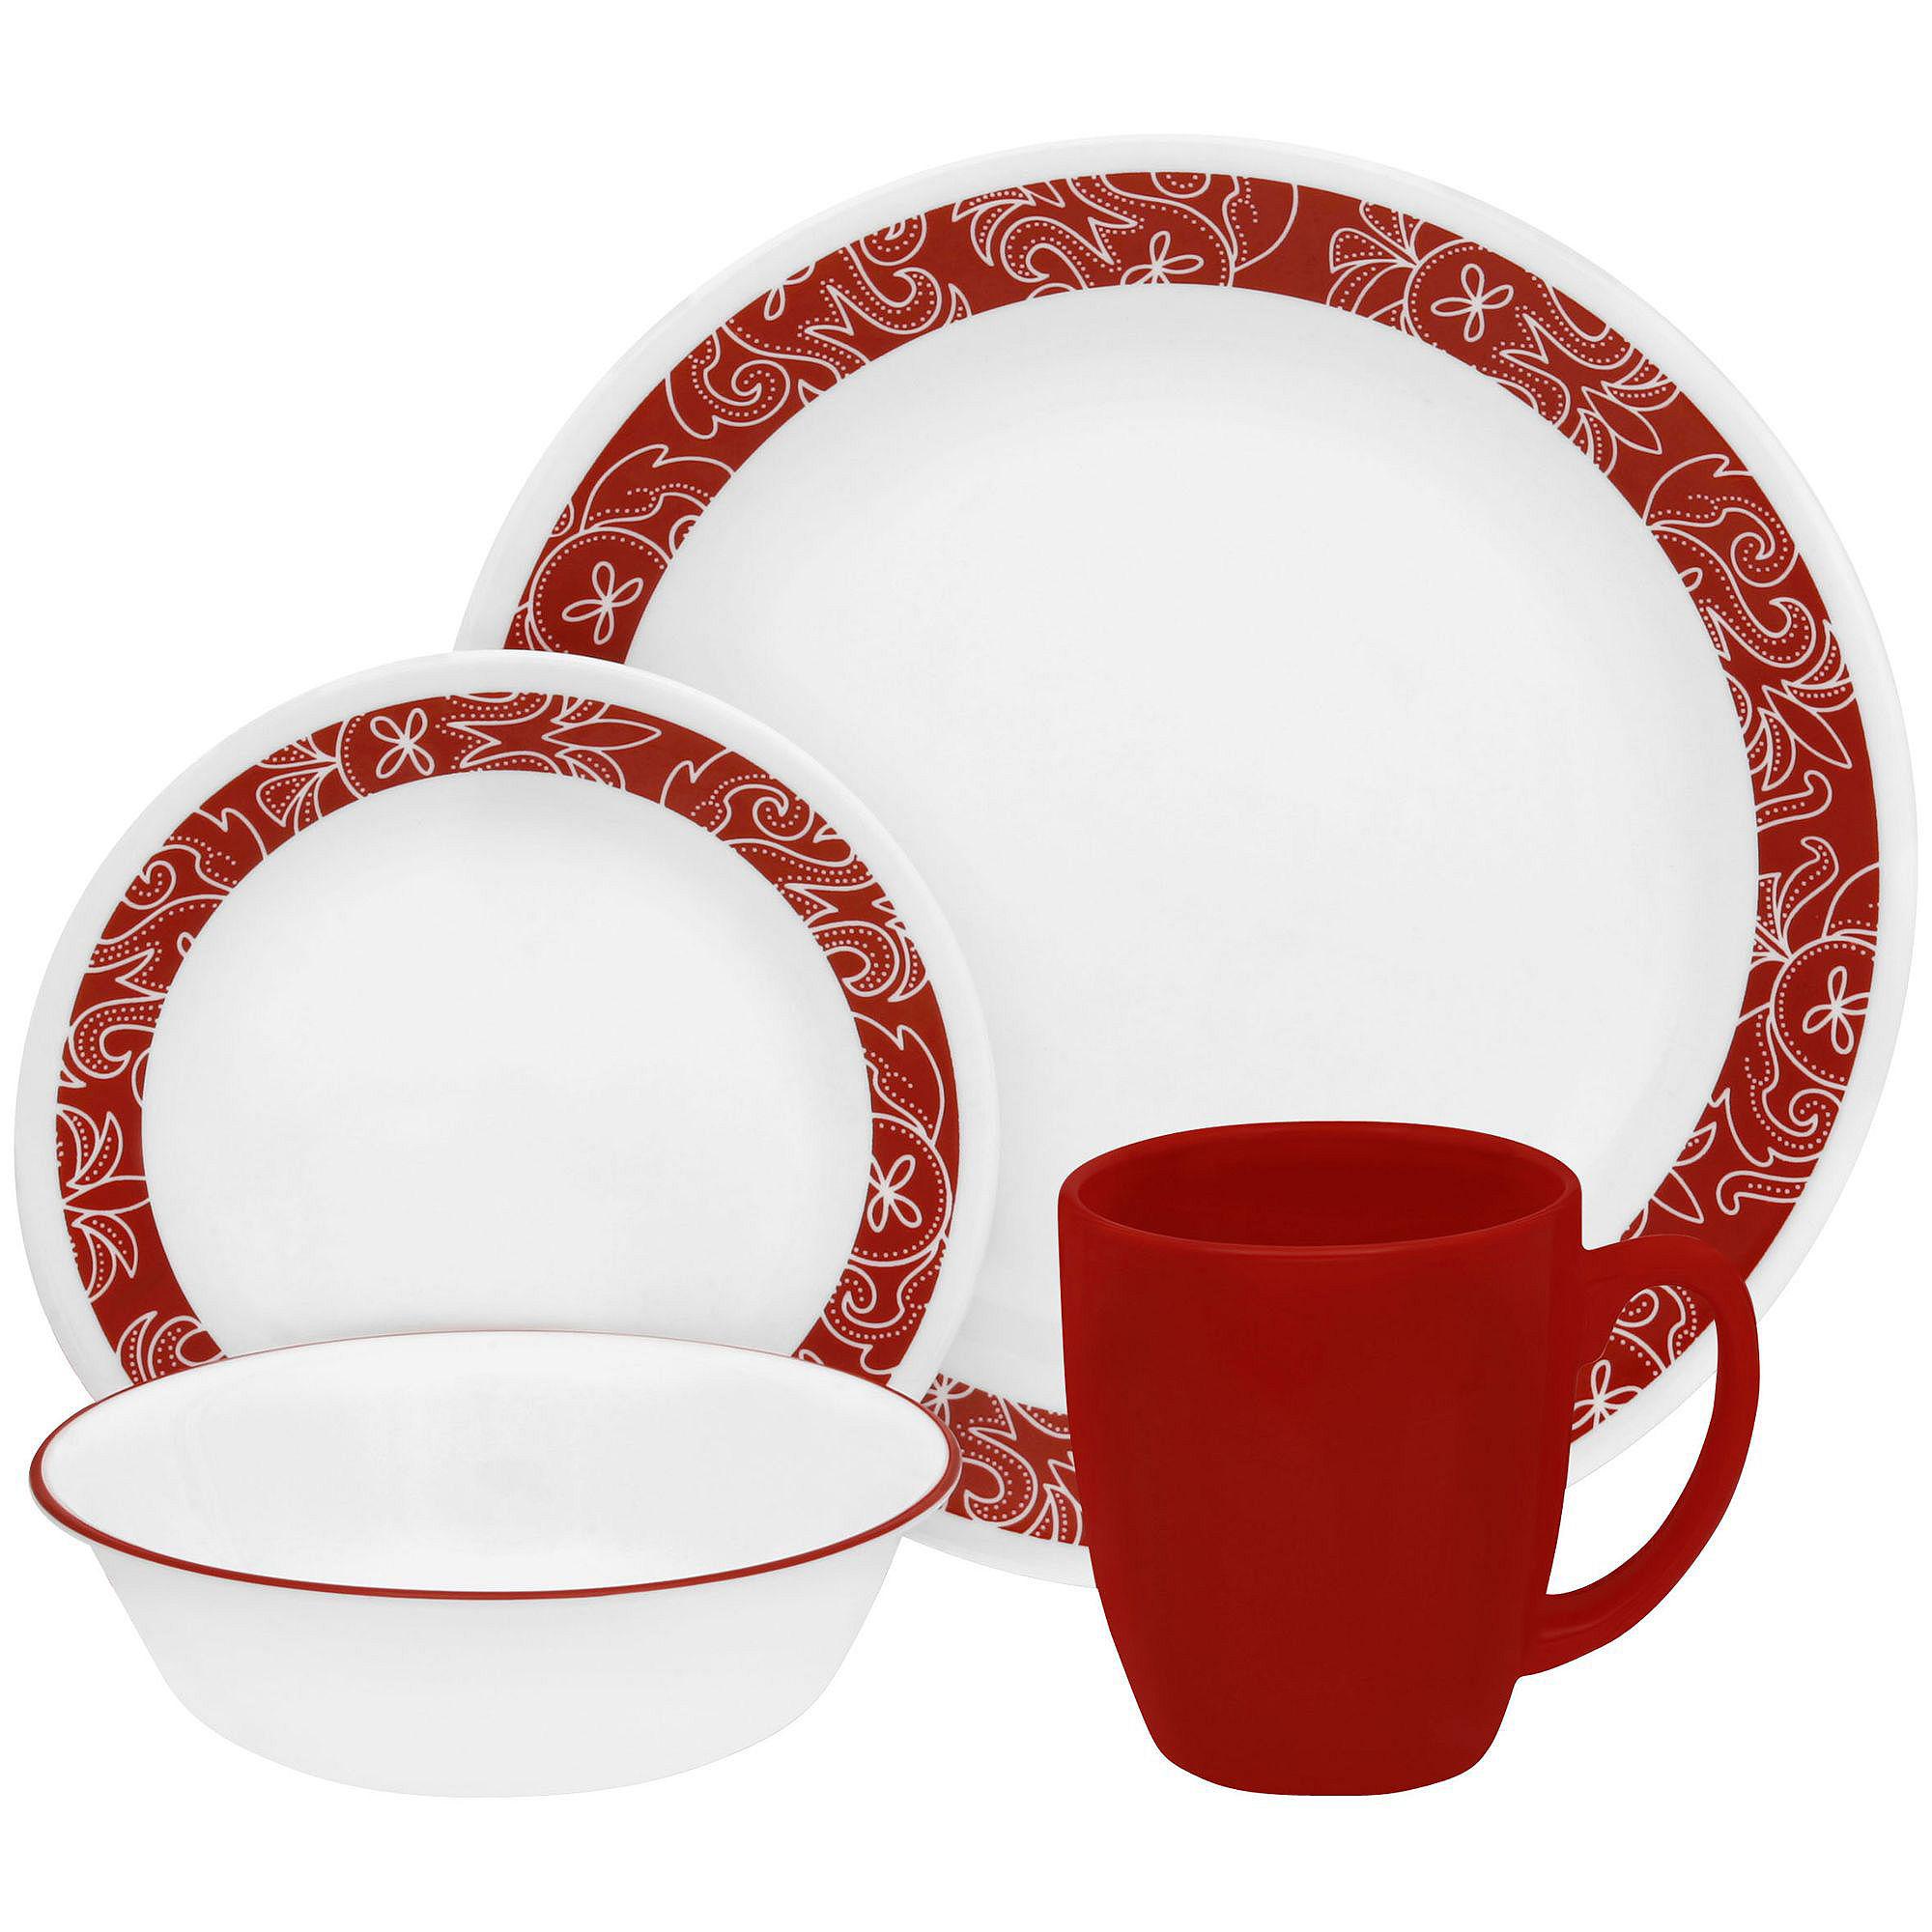 071160107427 Upc Corelle 174 Muret 16 Piece Dinnerware Set